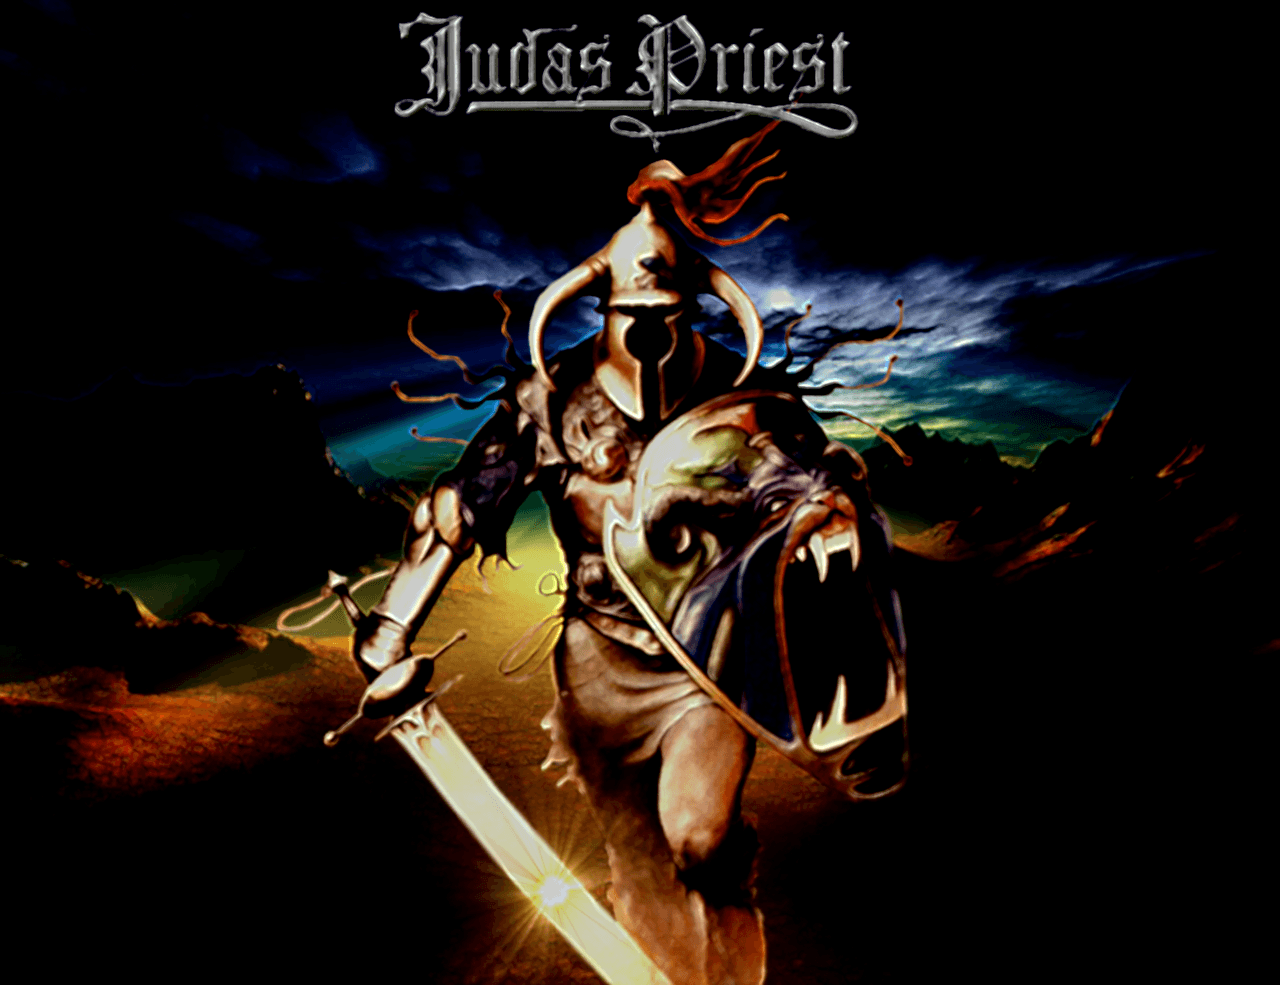 Judas Priest Wallpapers Wallpaper Cave